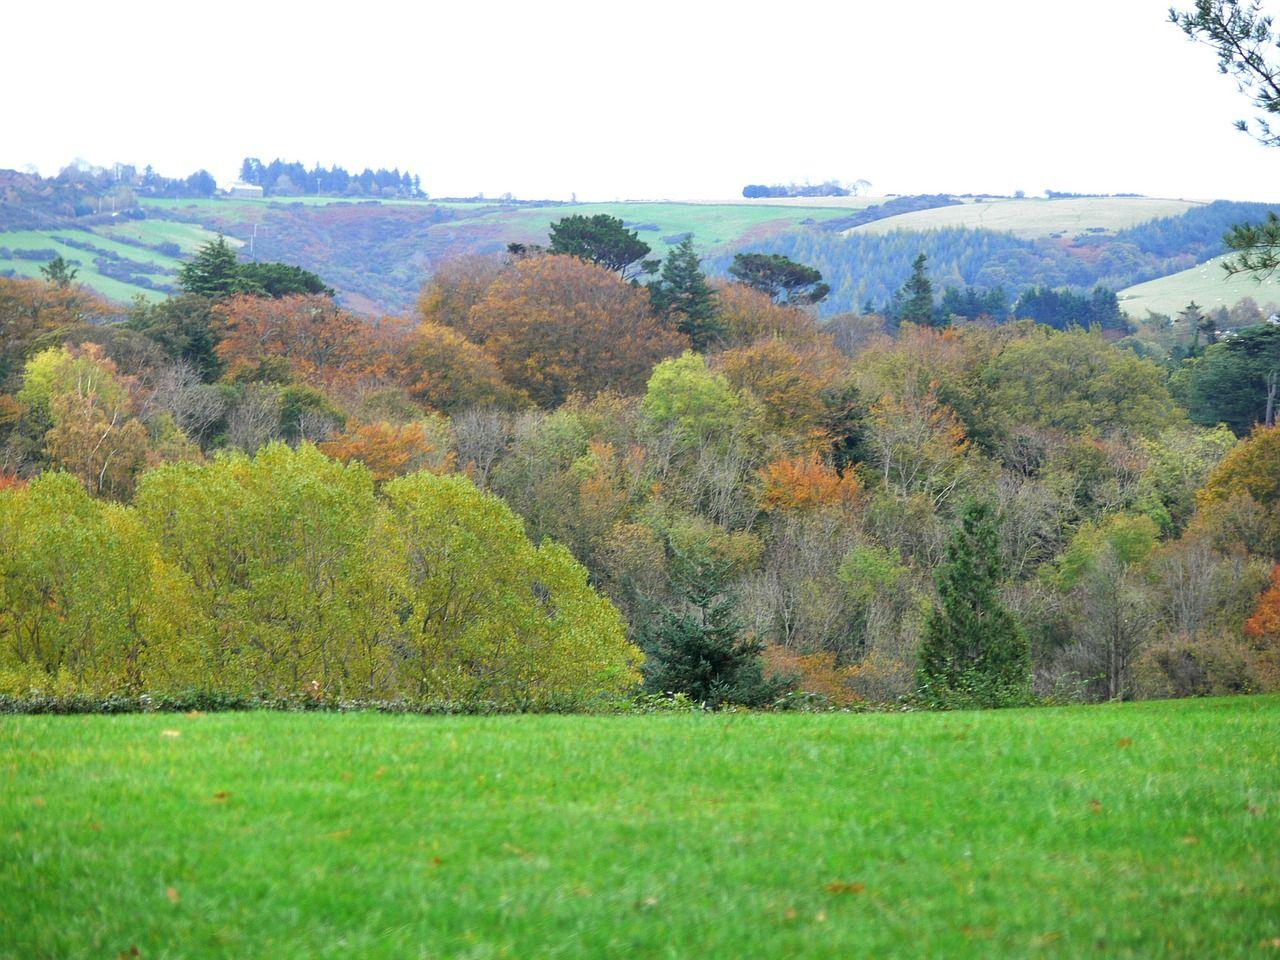 Forest Autumn Ireland Trees Colorful Forest Forest Autumn Ireland Trees Colorful Forest Images Of Ireland Natural Landmarks Dublin Ireland Autumn grass field mountain forest trees